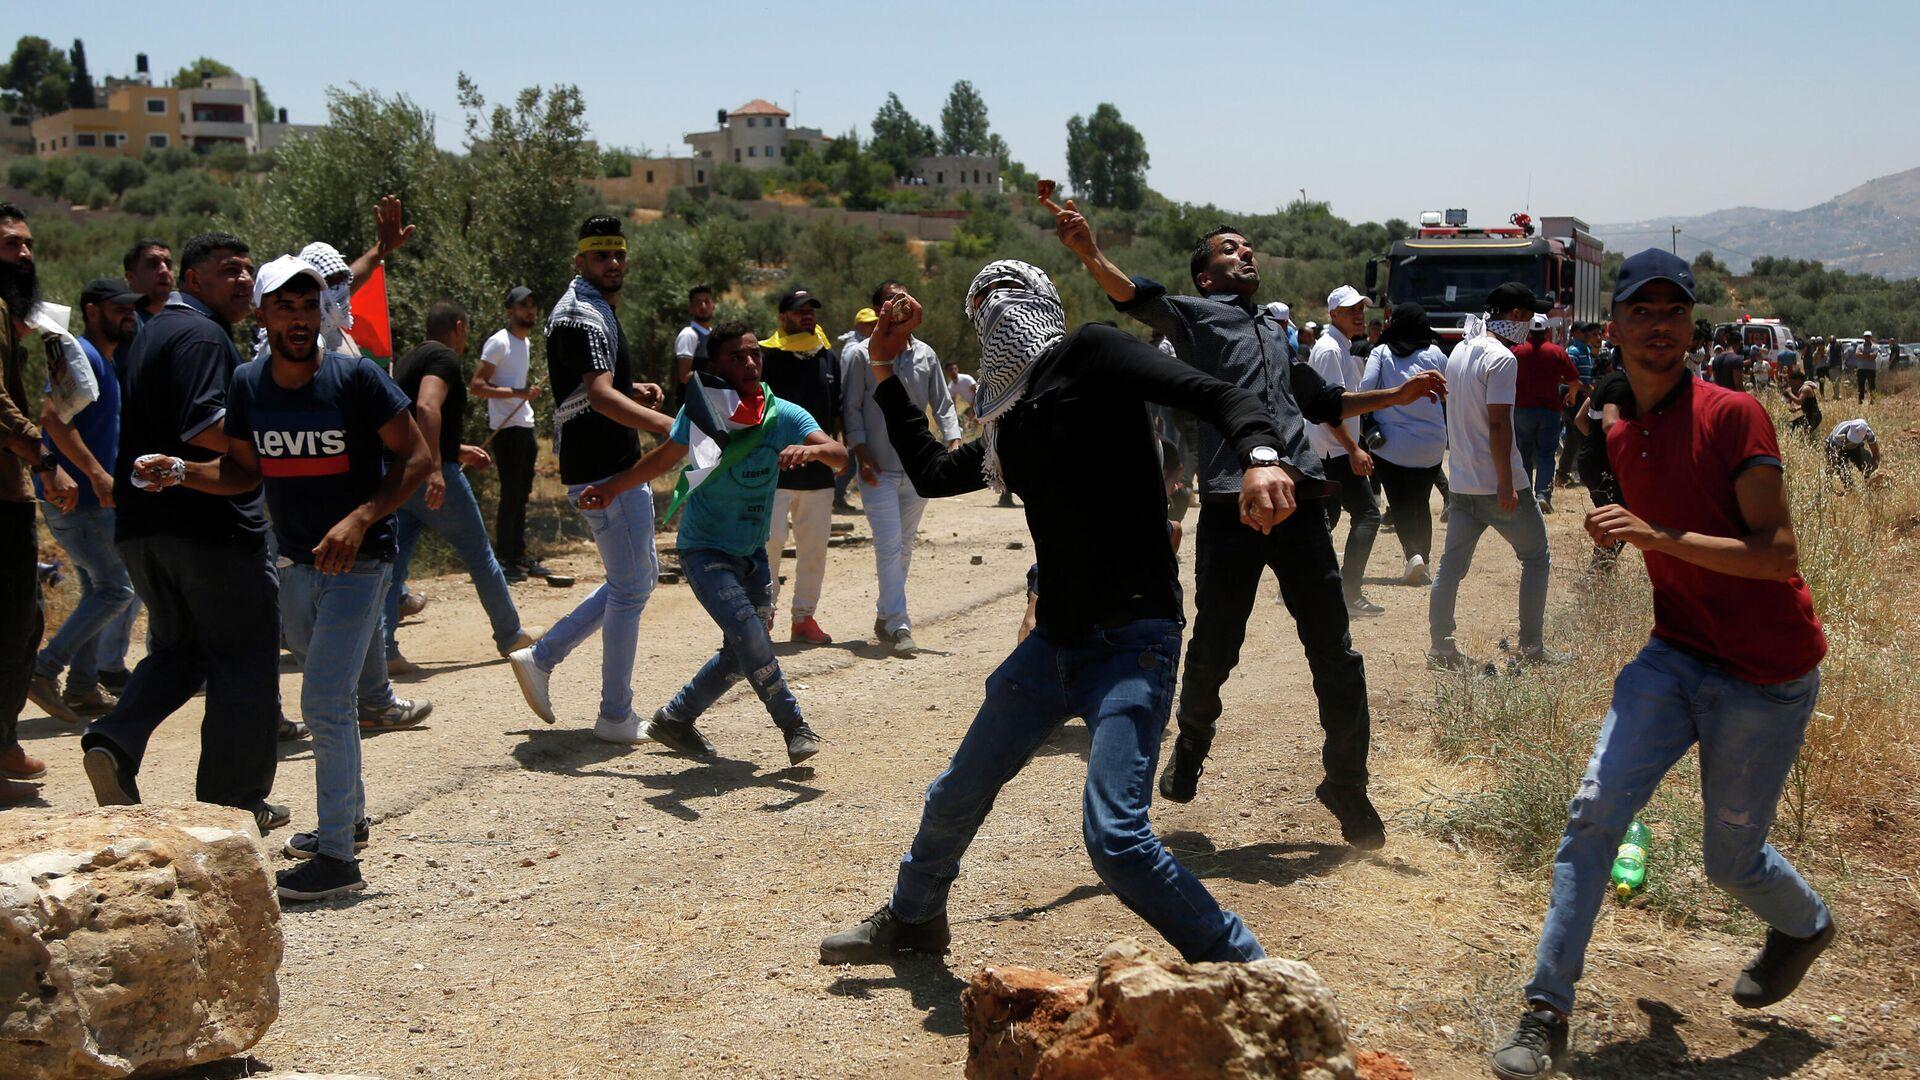 Столкновения палестинцев с израильтянами - РИА Новости, 1920, 29.01.2020